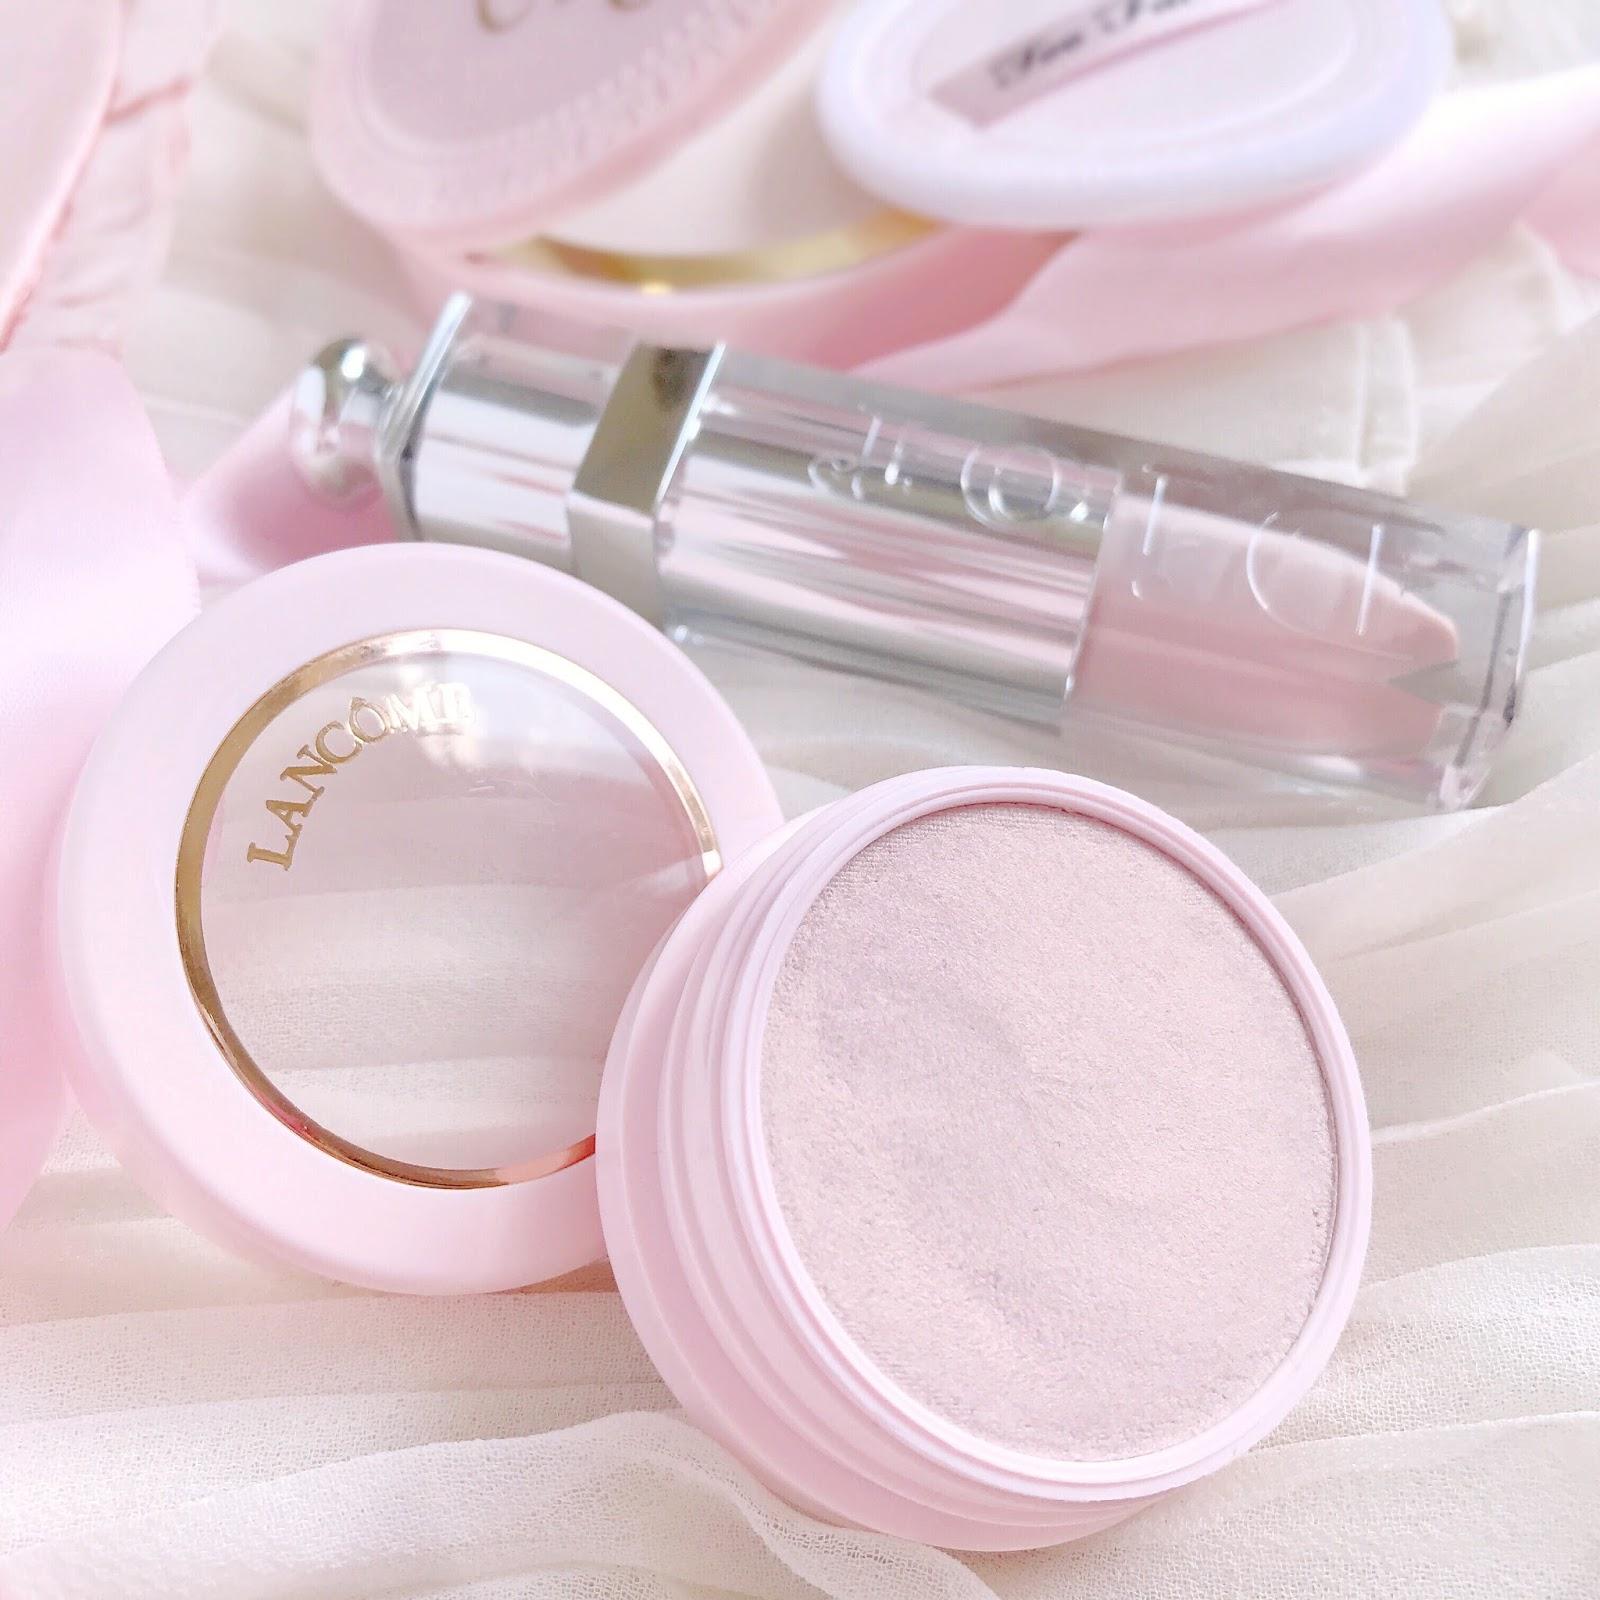 Princessy Makeup Splurge | Lancome Blush Subtil Creme Je m'appelle Rose